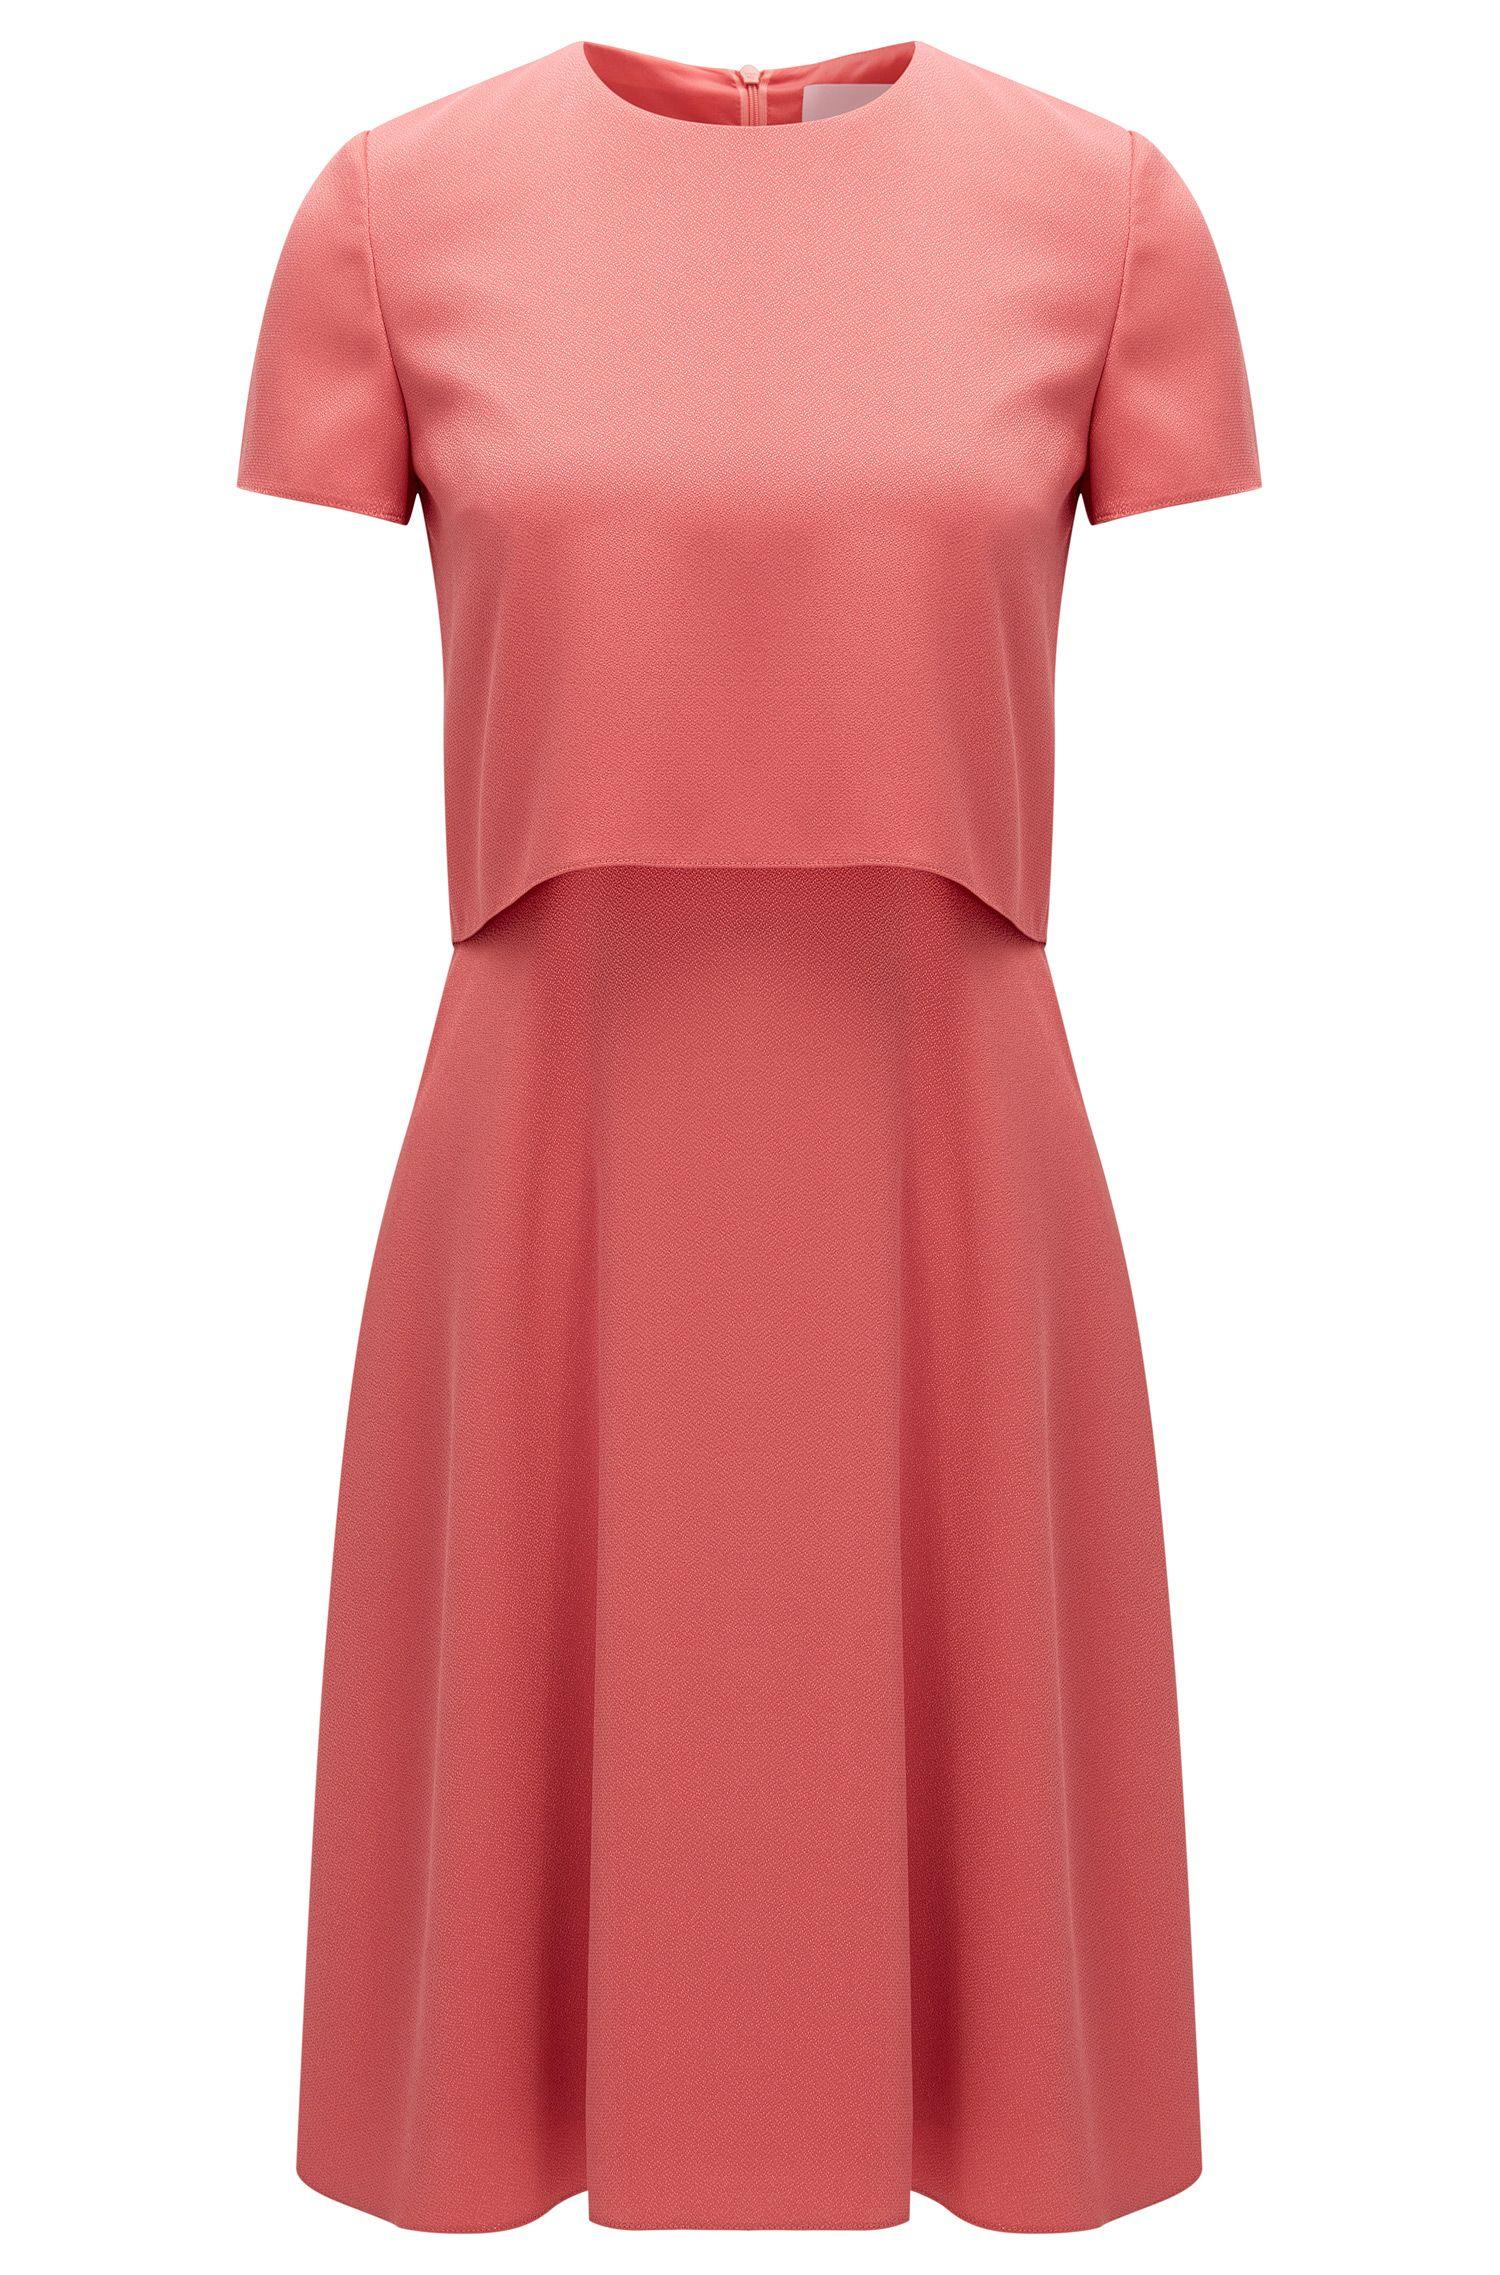 'Dicenda' | Cropped Crepe Dress